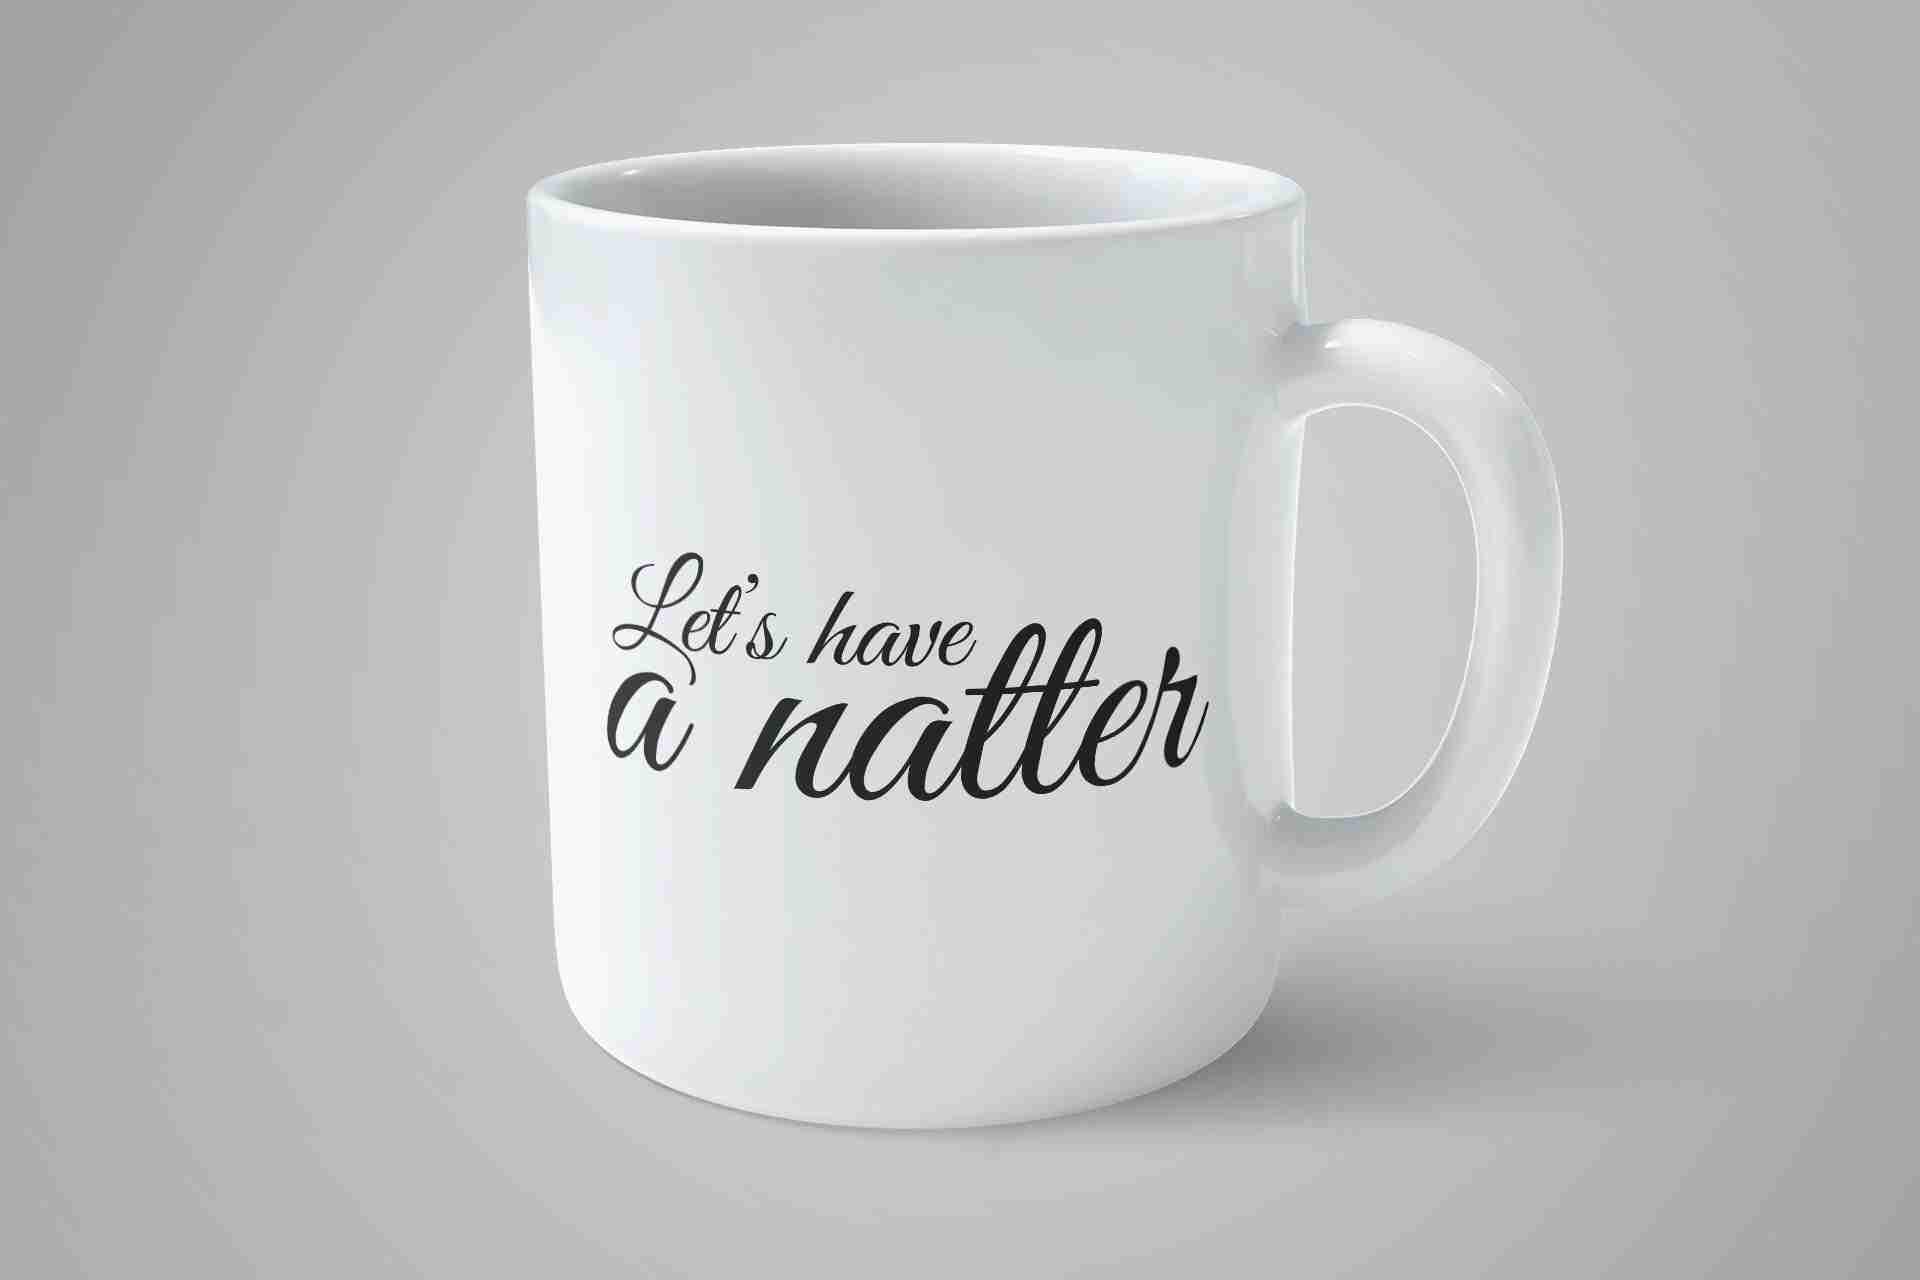 natter-Mug-MockUp_1